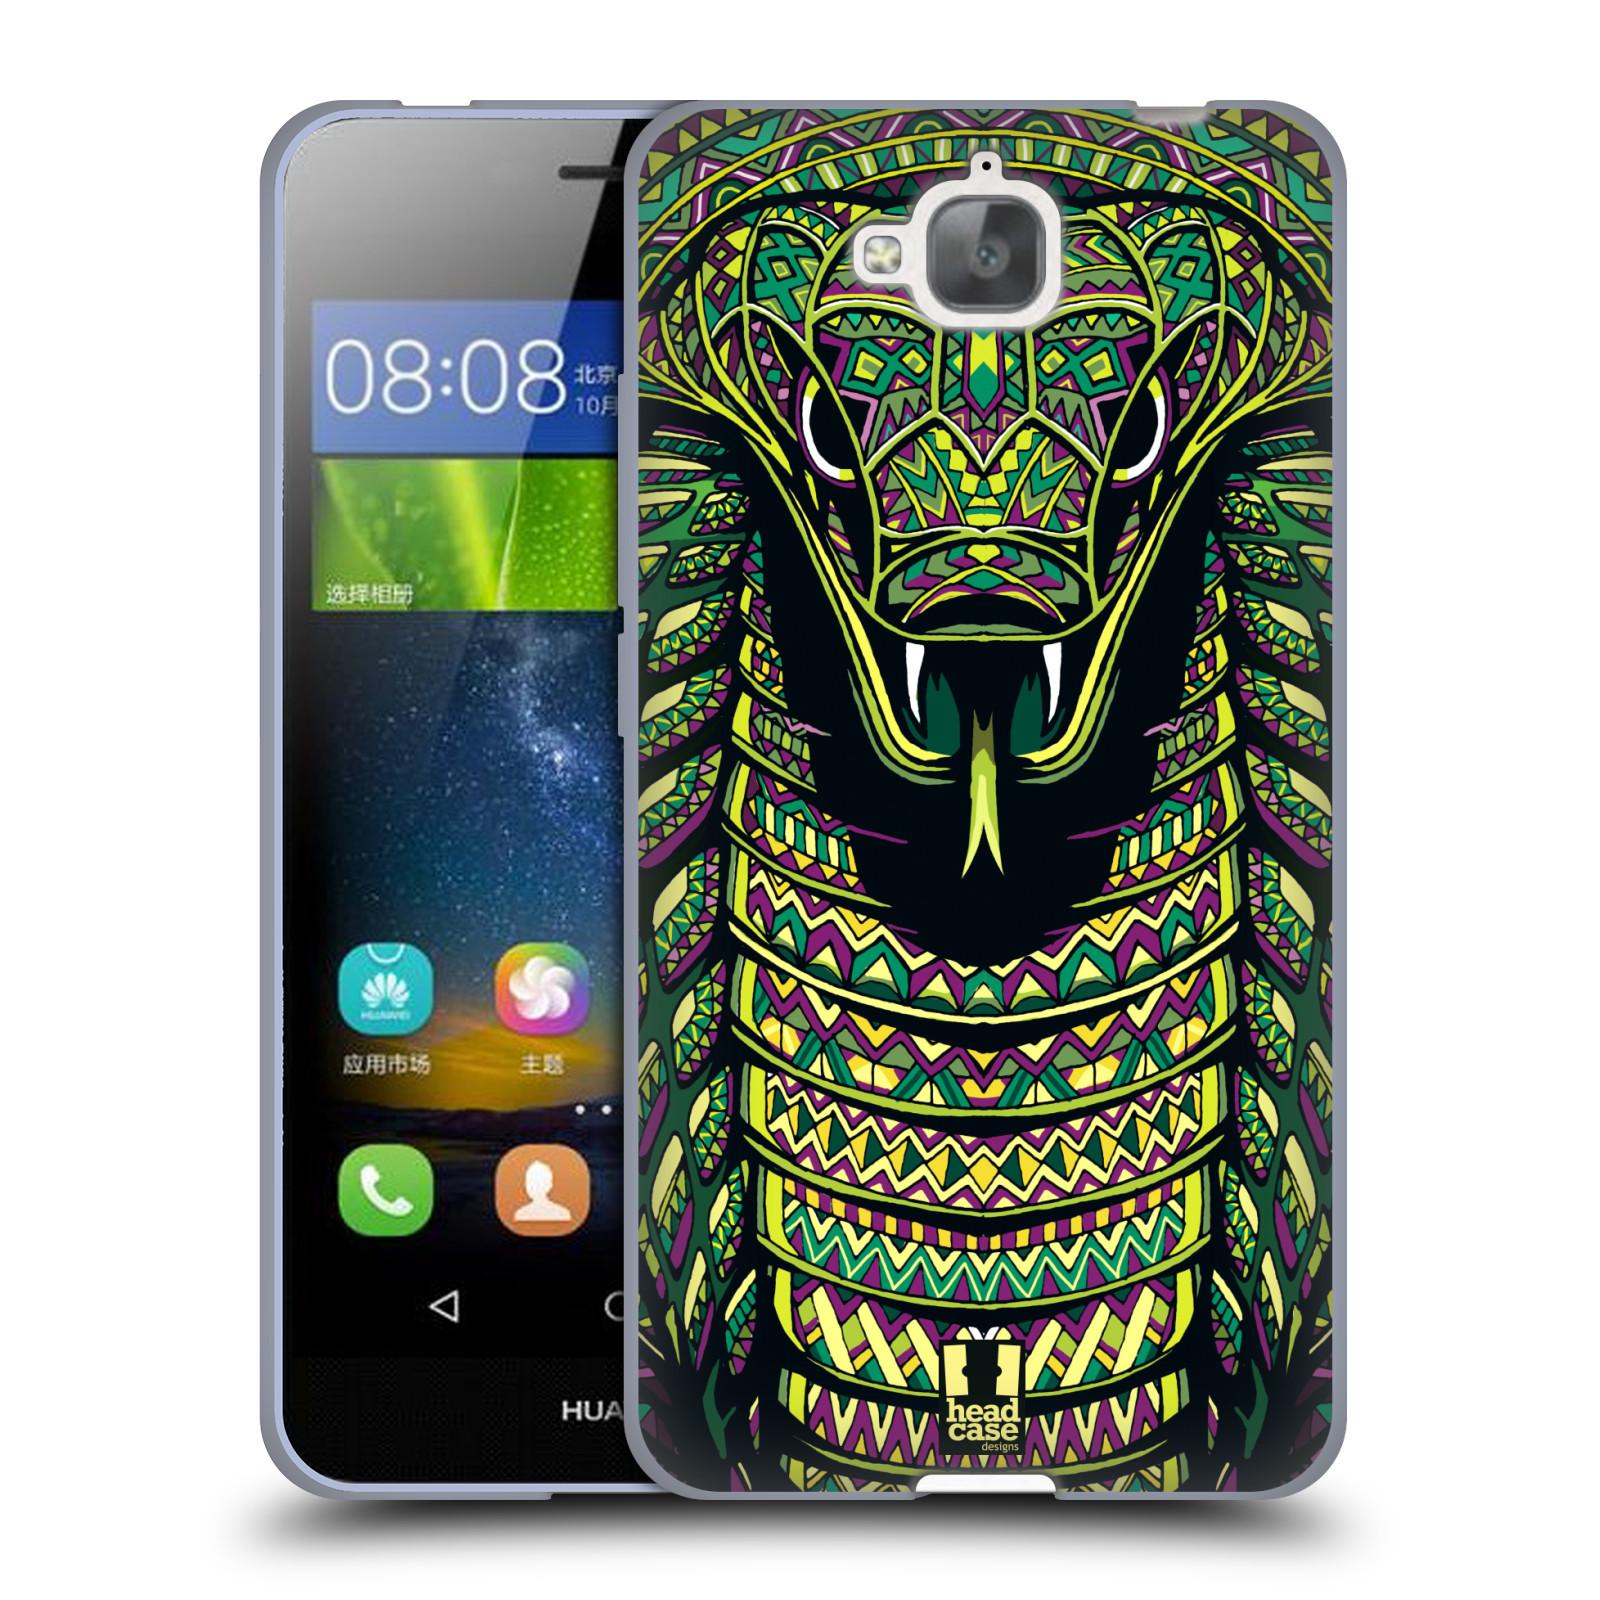 Silikonové pouzdro na mobil Huawei Y6 Pro Dual Sim HEAD CASE AZTEC HAD